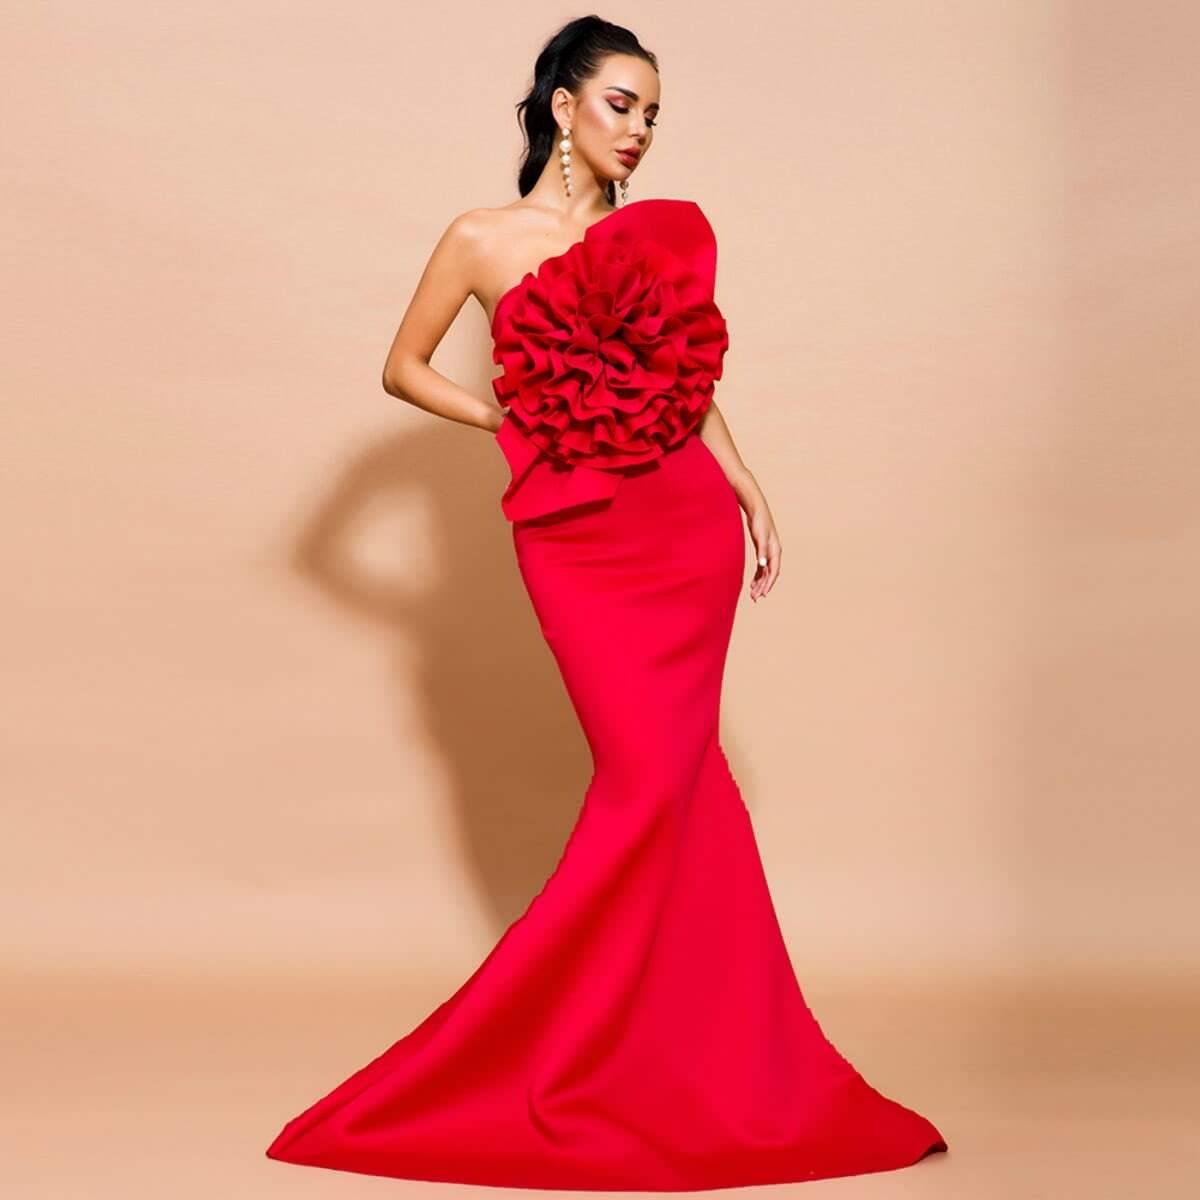 платье-русалка без бретелек с оборками